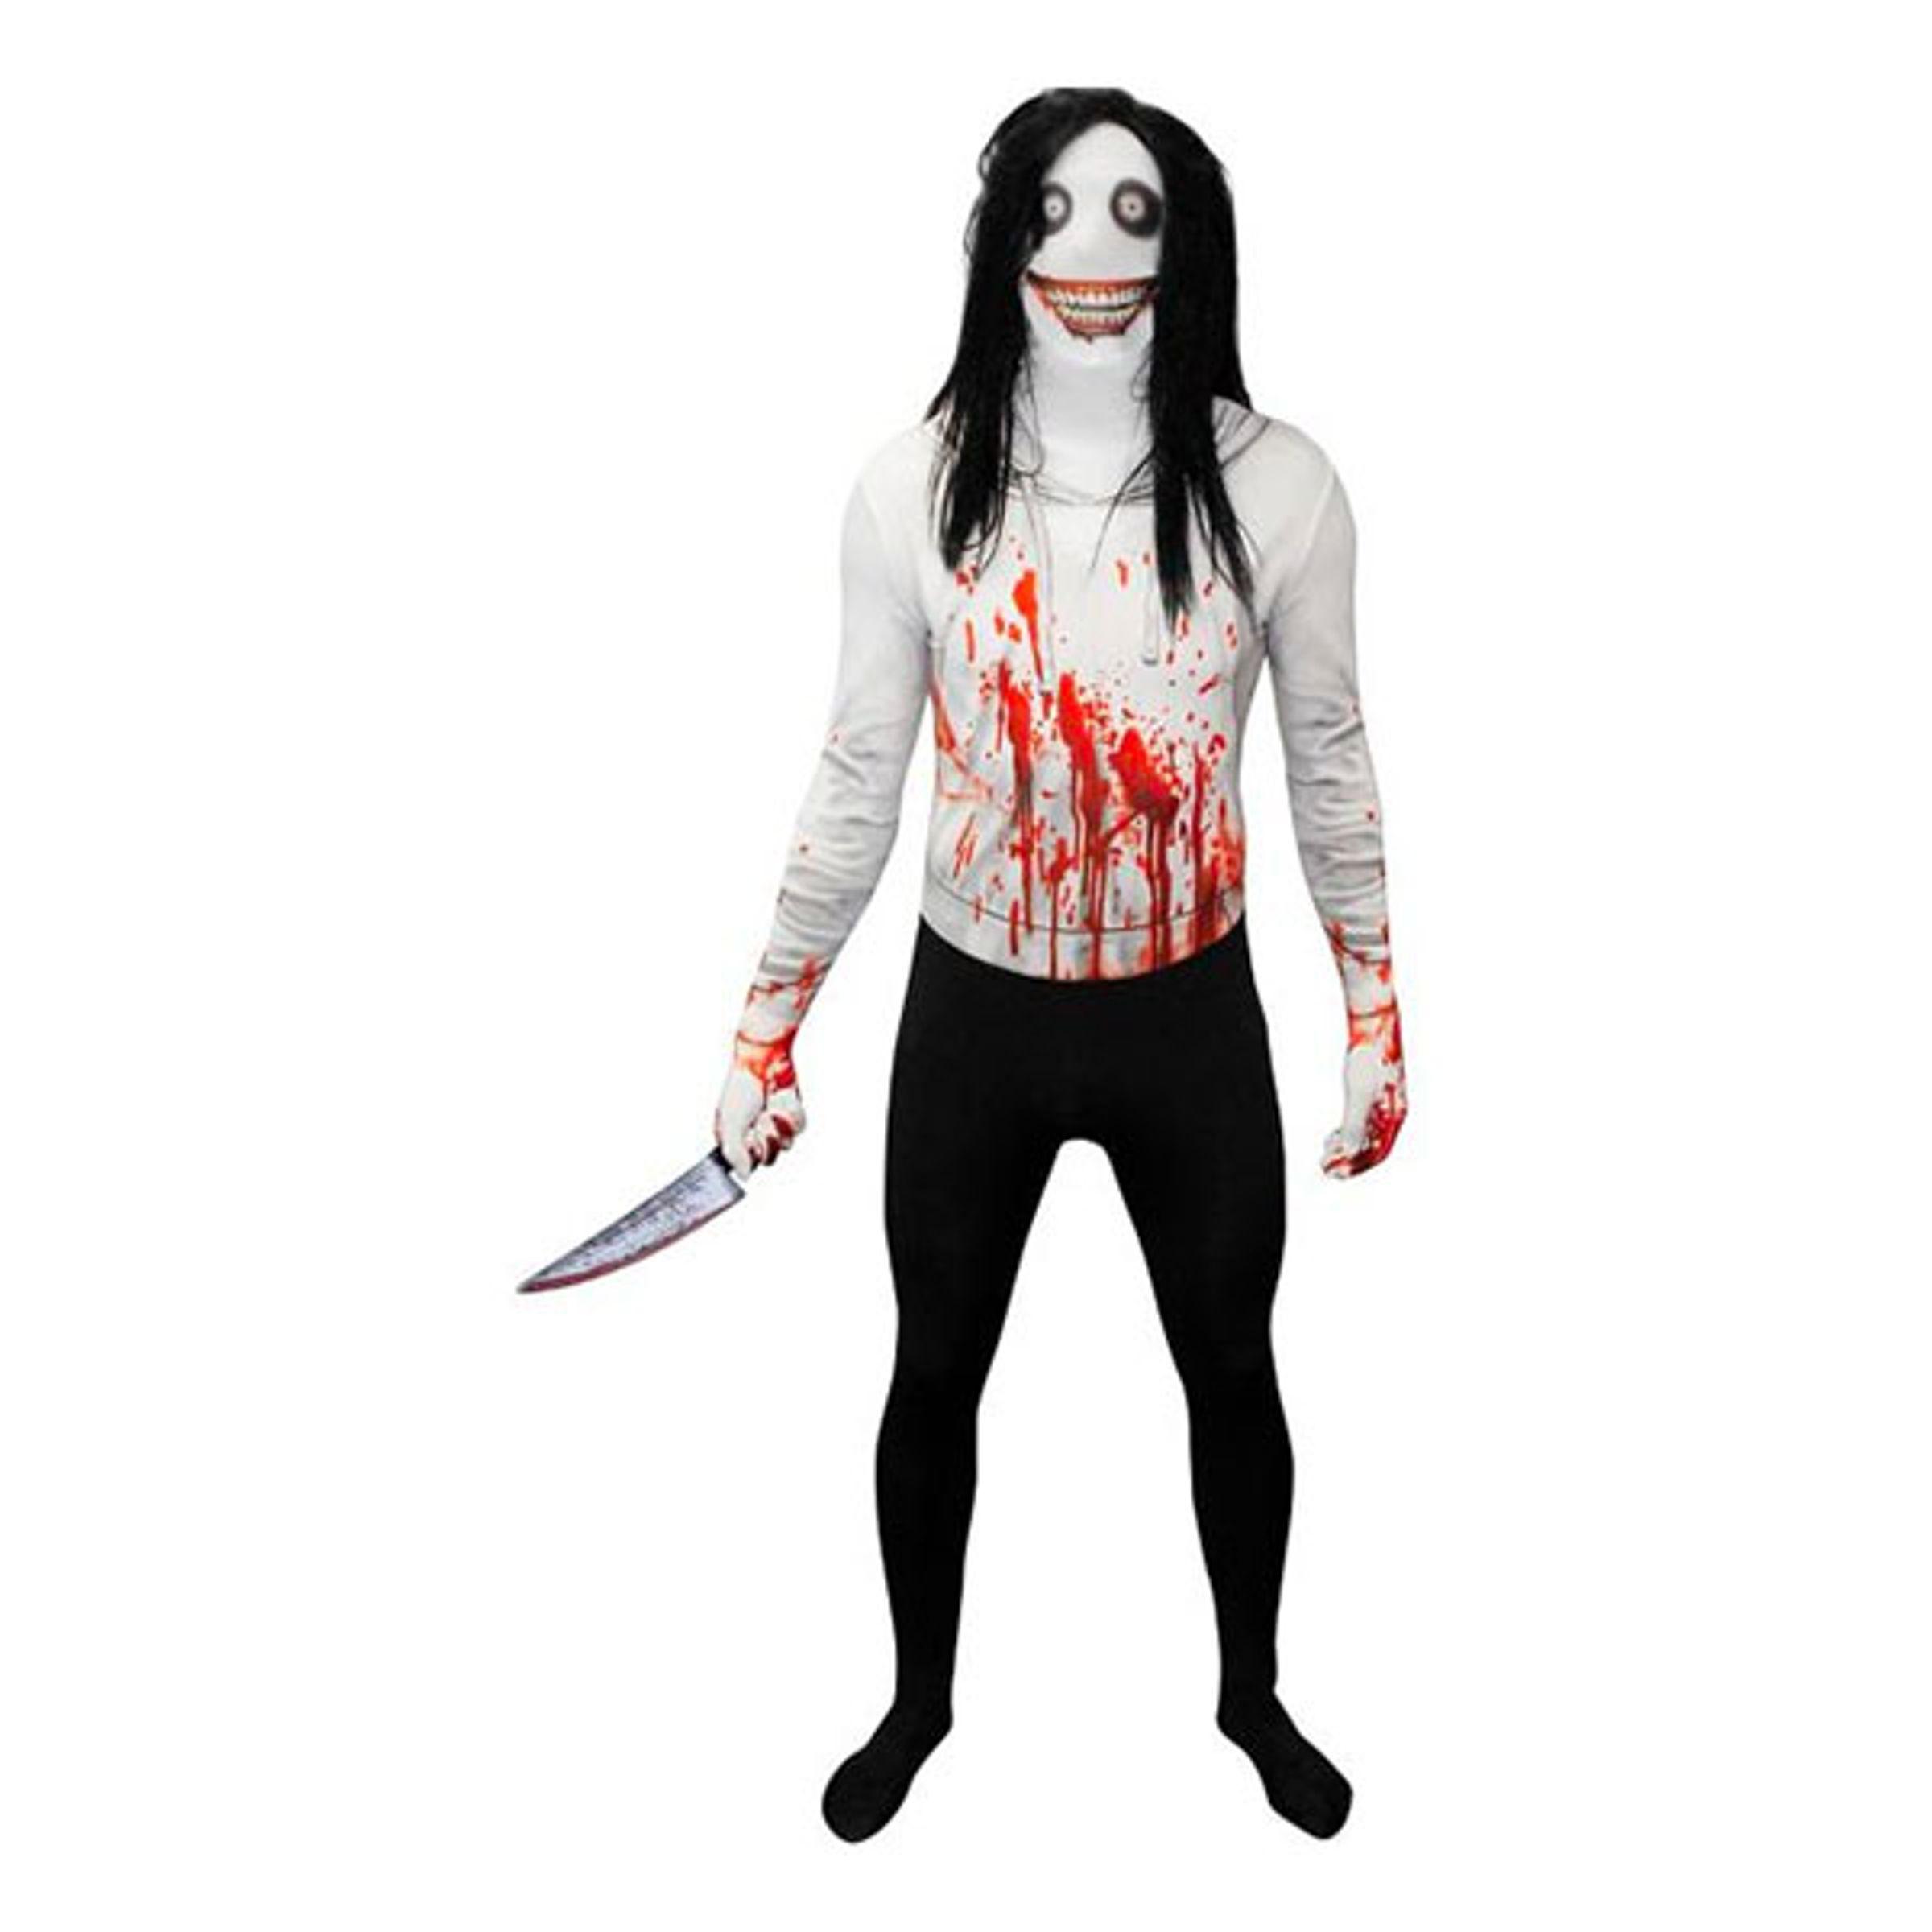 Jeff the Killer Morphsuit - Large